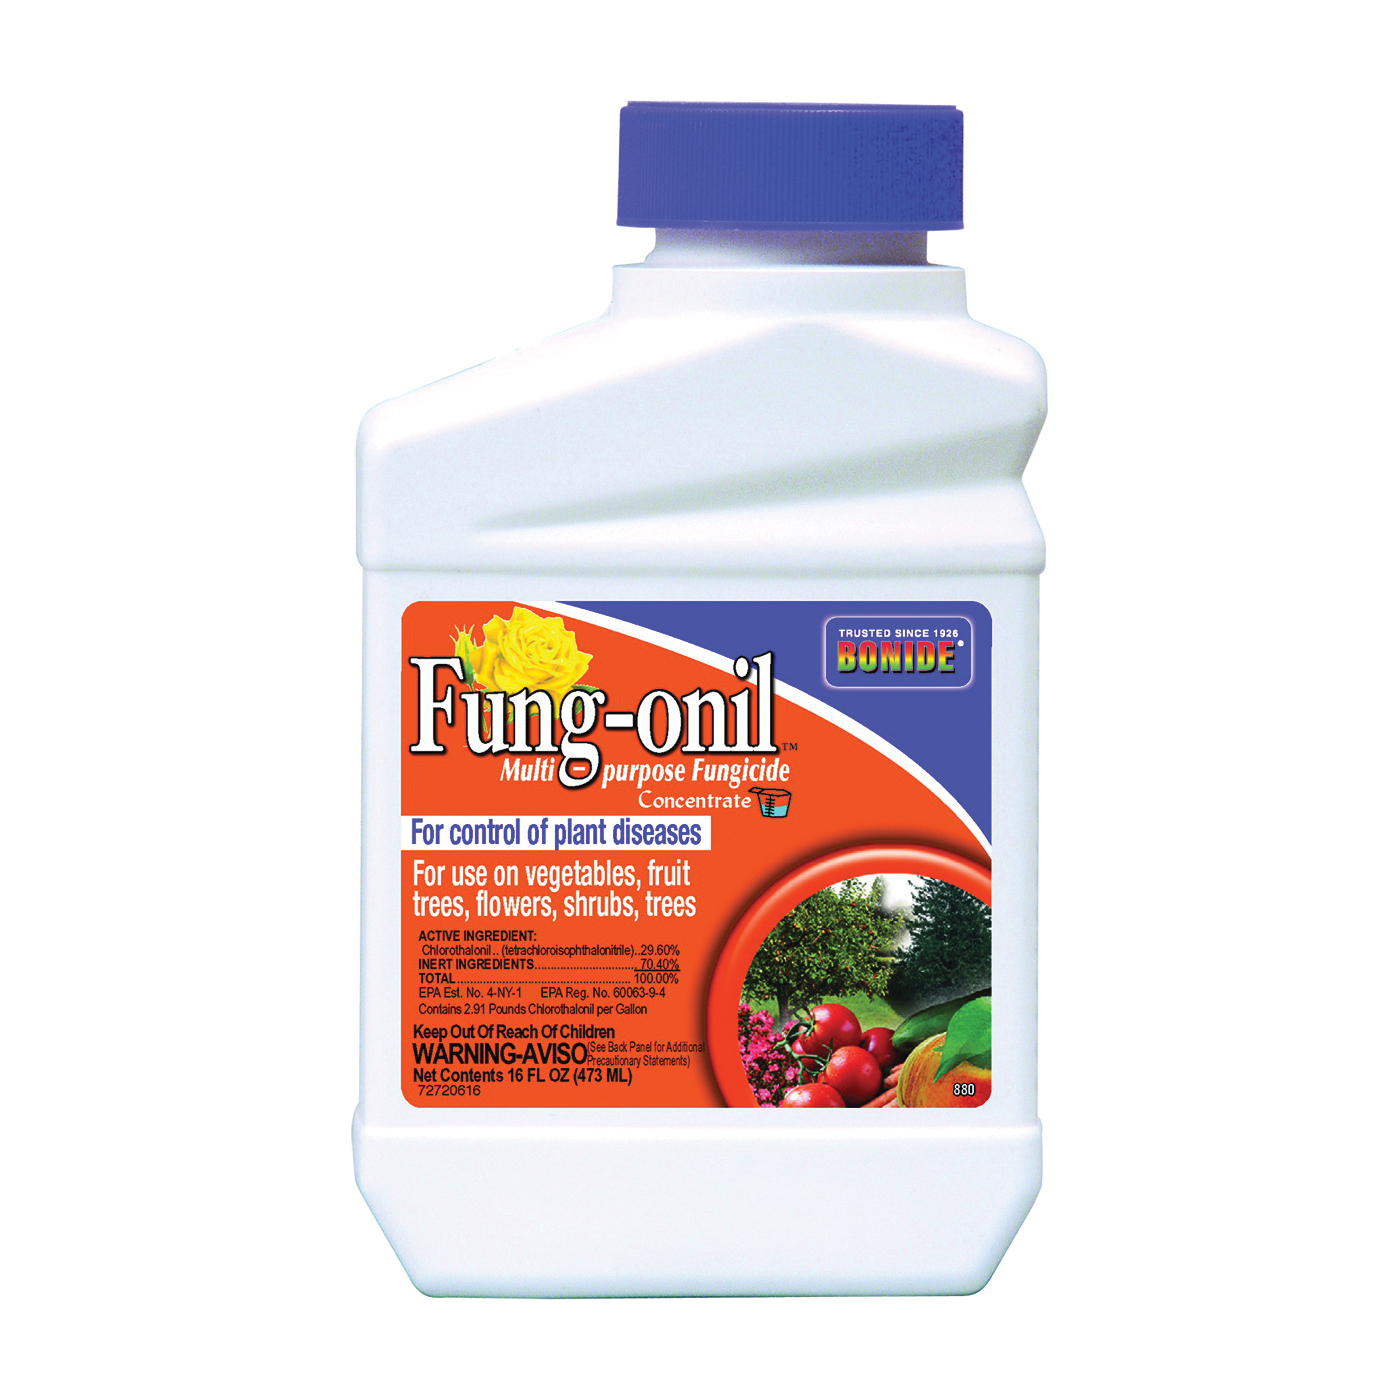 Fung-onil 880